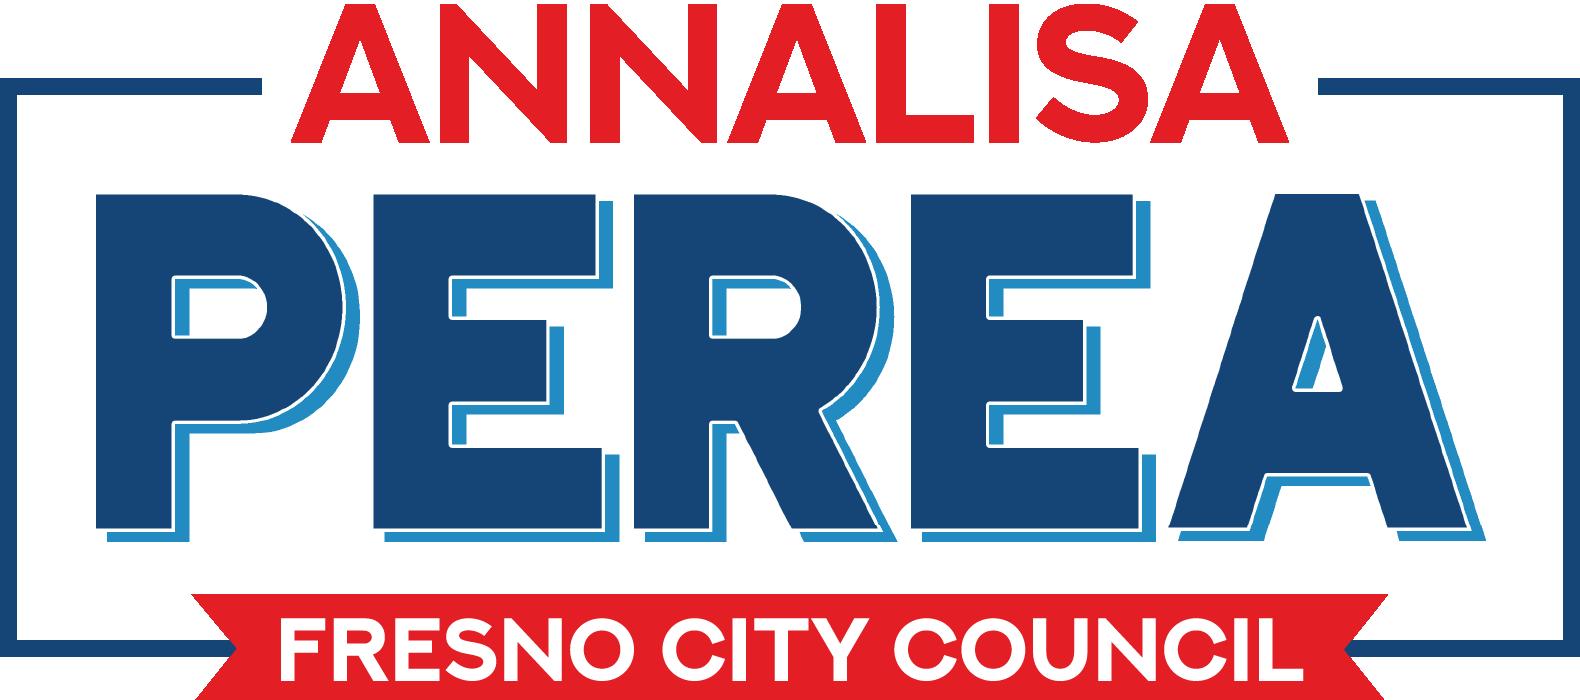 Perea for City Council 2022